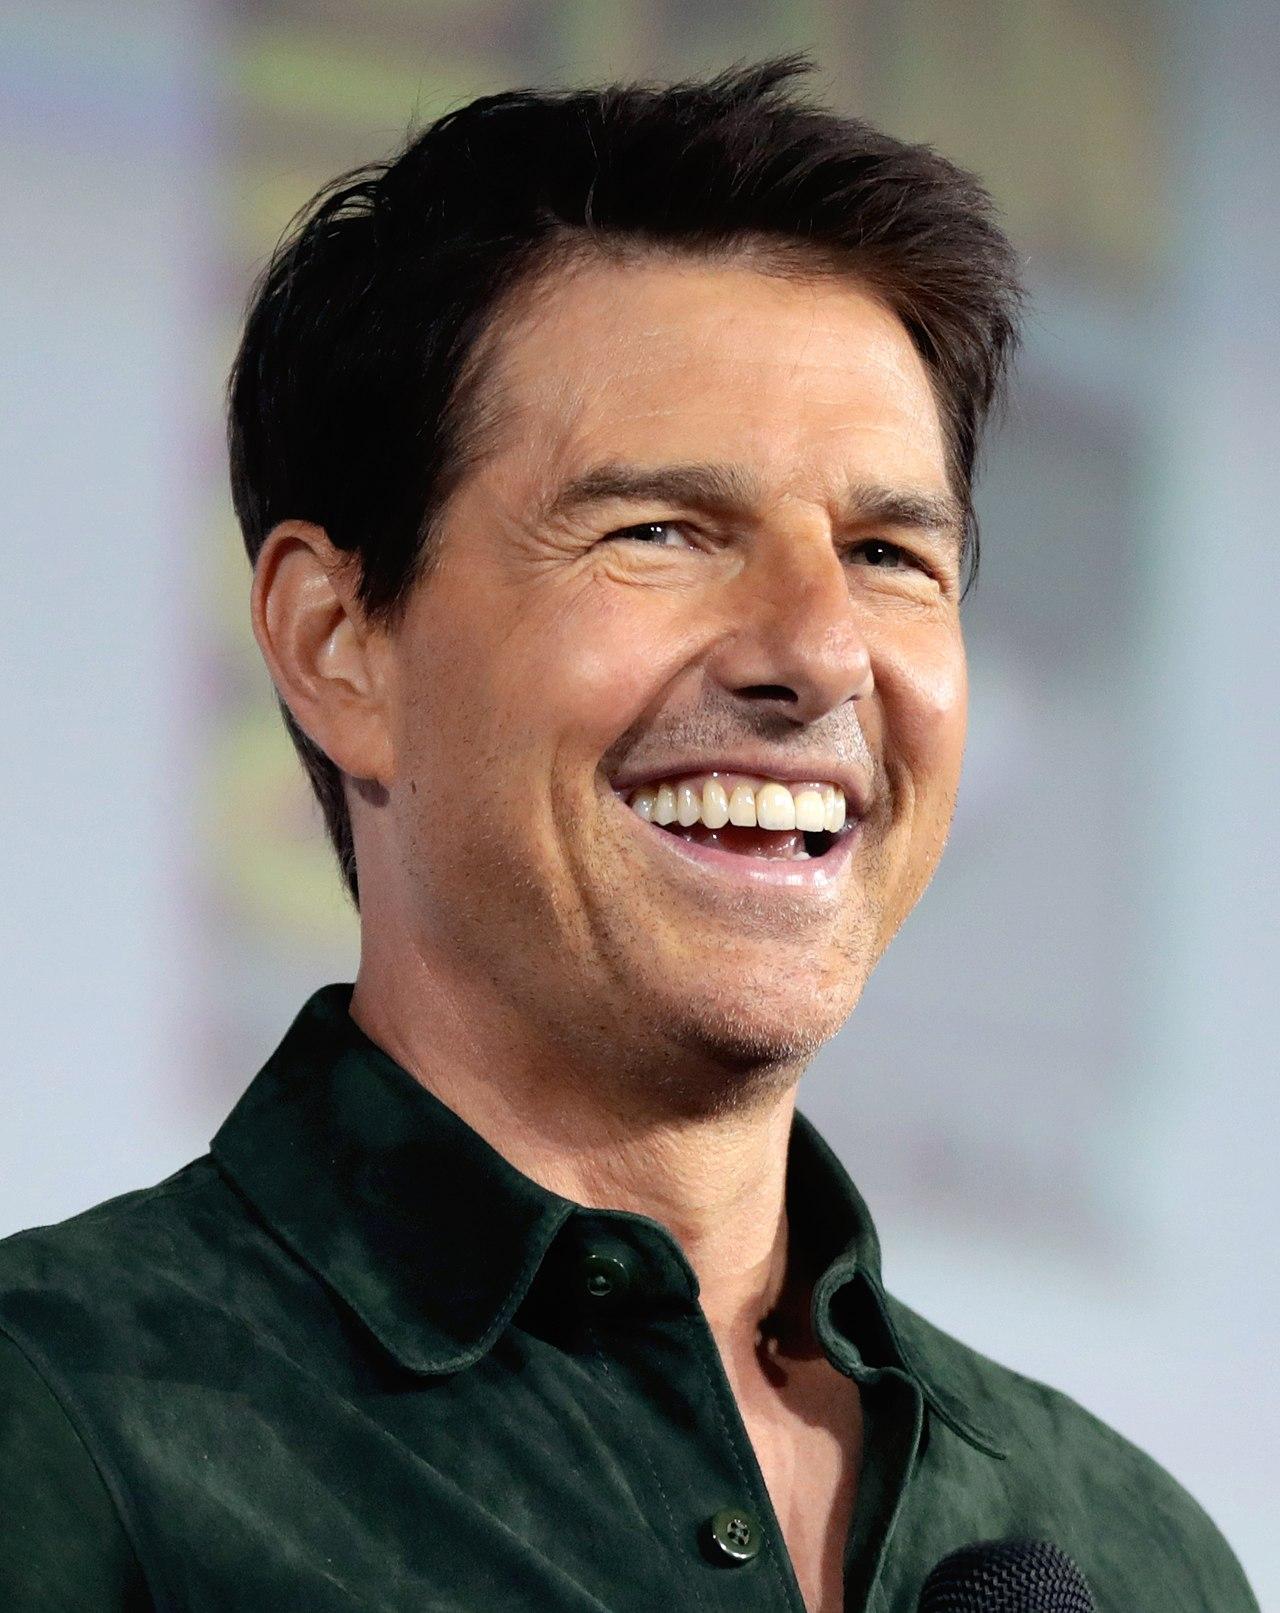 Tom Cruise at an event for Top Gun: Maverick (2021)